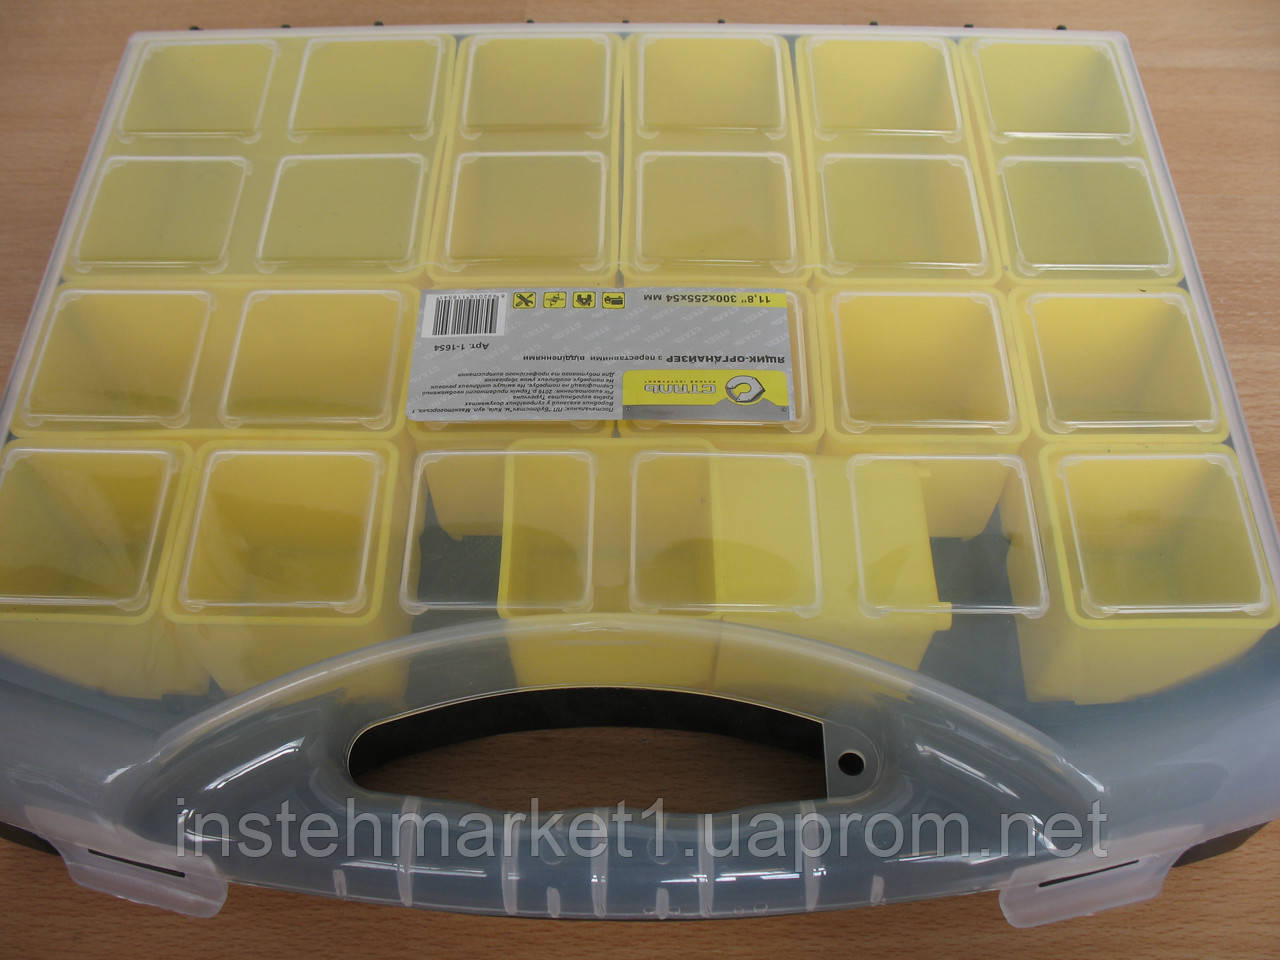 Ящик органайзер Сталь 1-1654 с ячейками (300х255х54 мм)